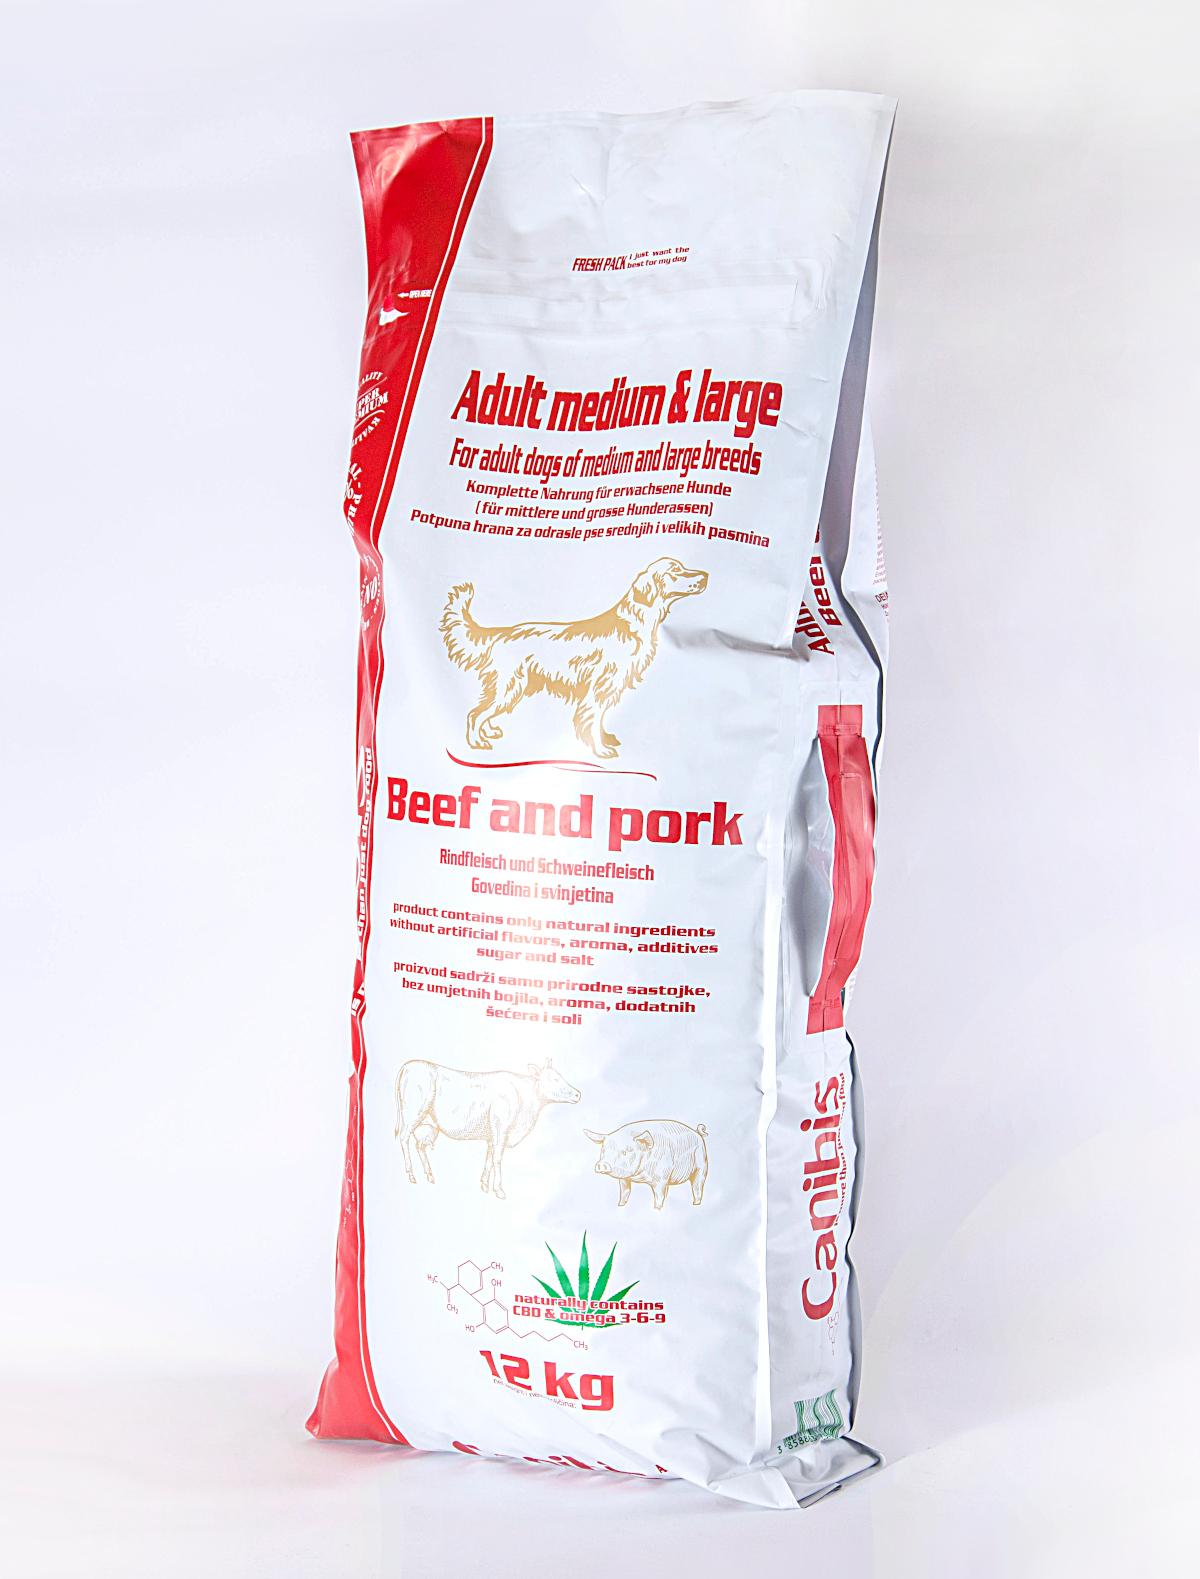 Canibis svinjetina govedina srednji veliki 12kg fr 1200